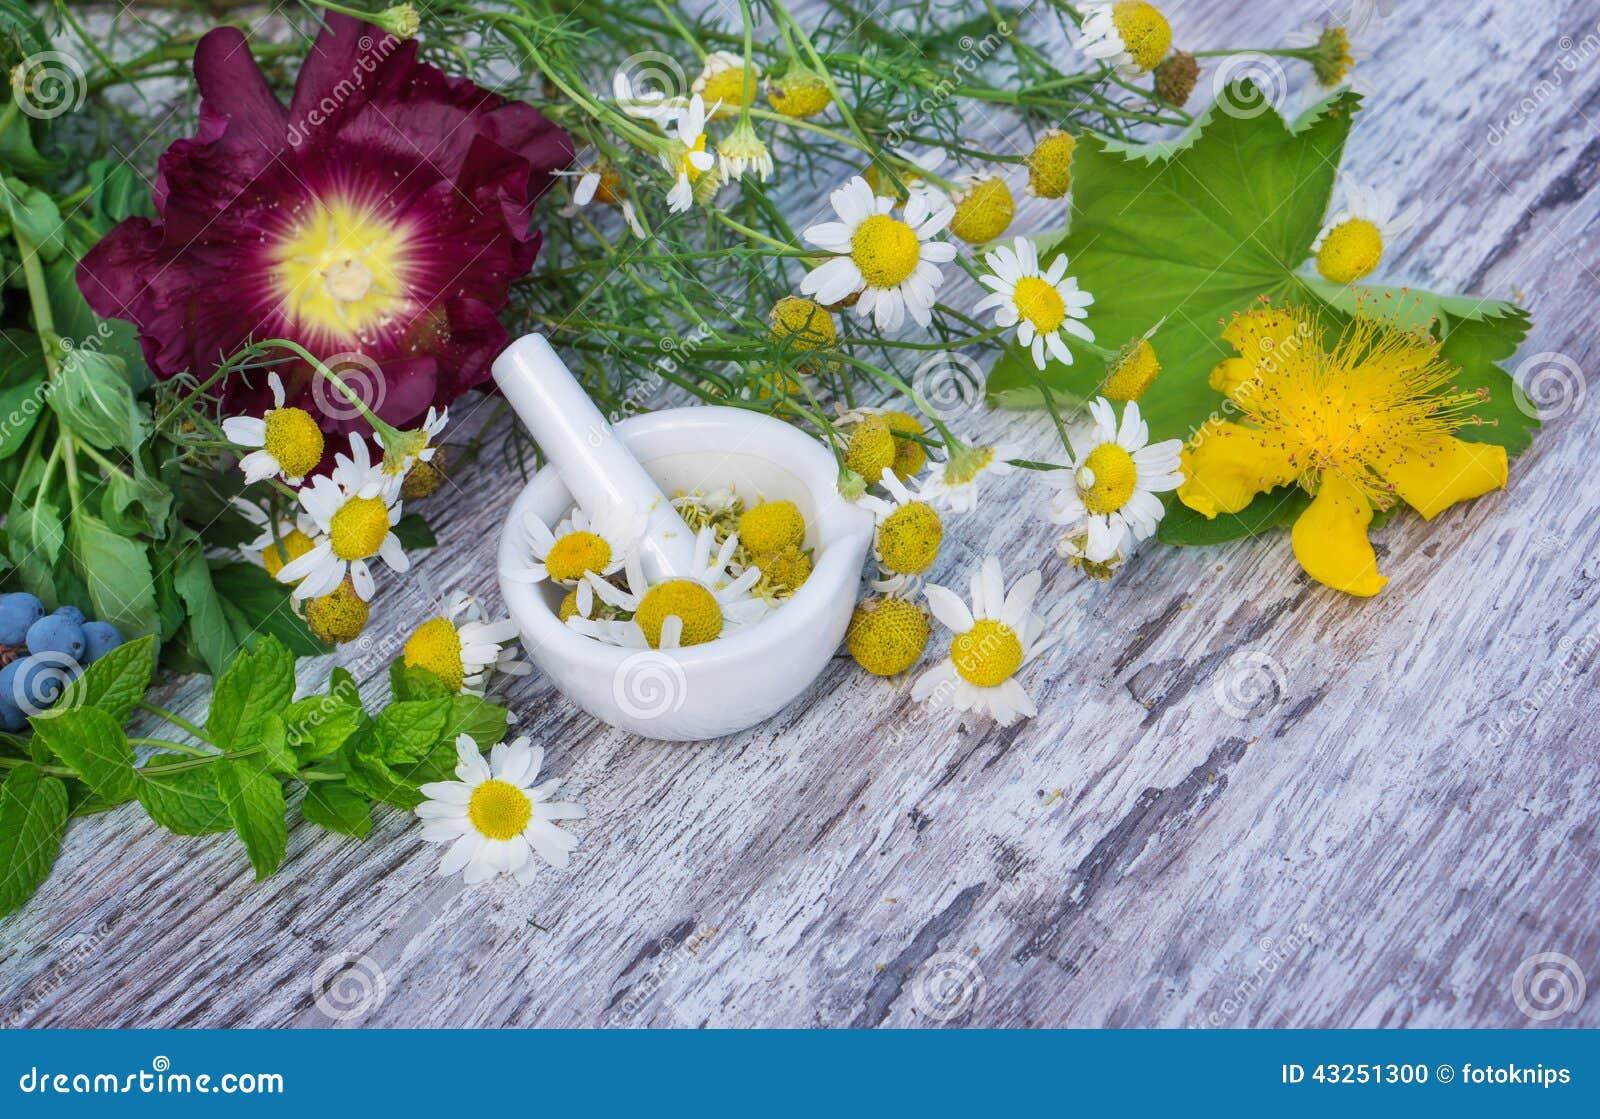 Kamille, St John wort, vrouwemantel, pepermunt